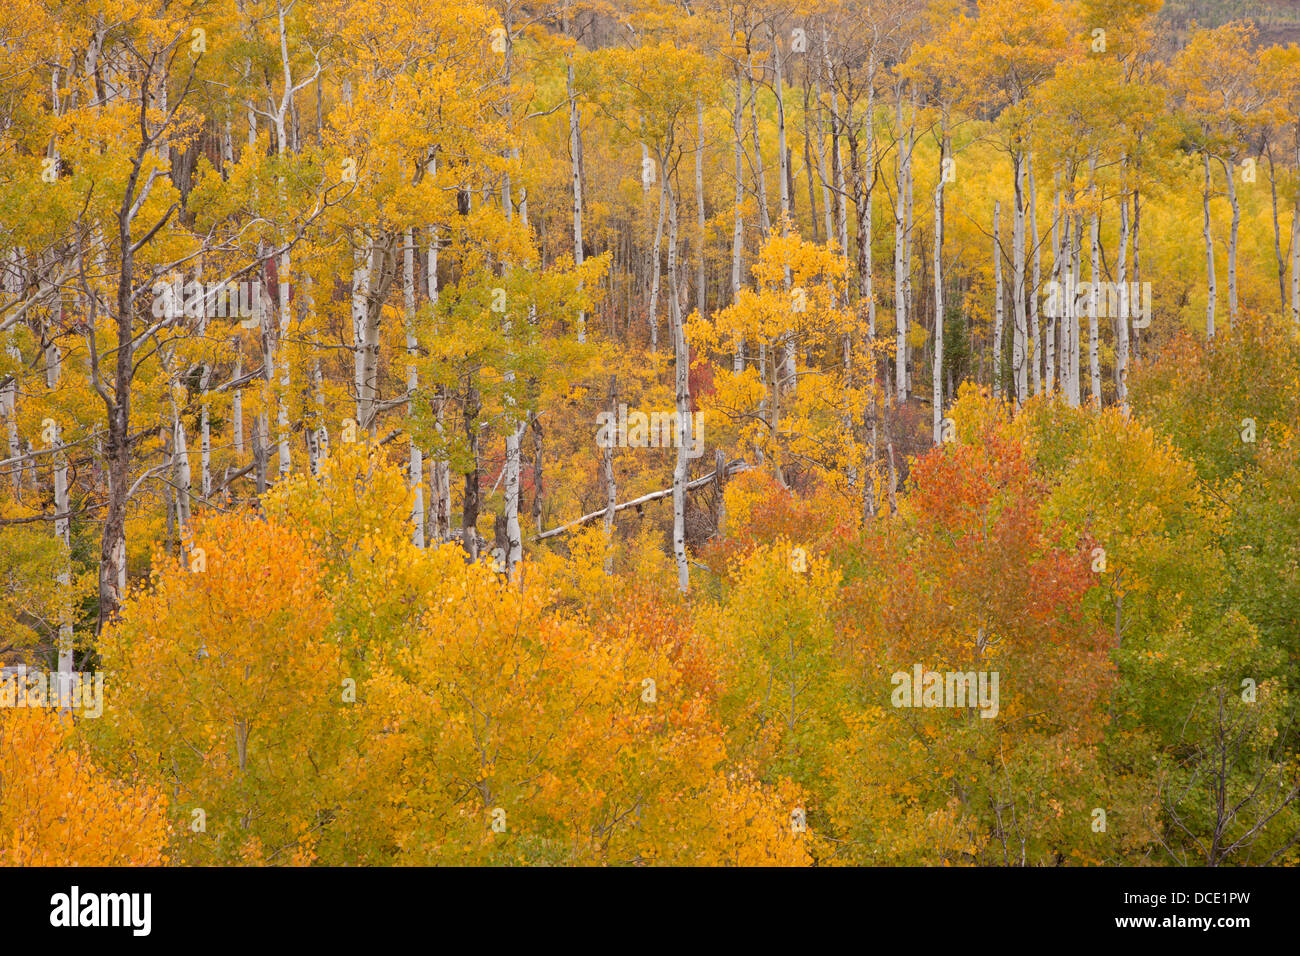 USA, Colorado, White River National Forest. Aspen grove in peak autumn foliage. - Stock Image